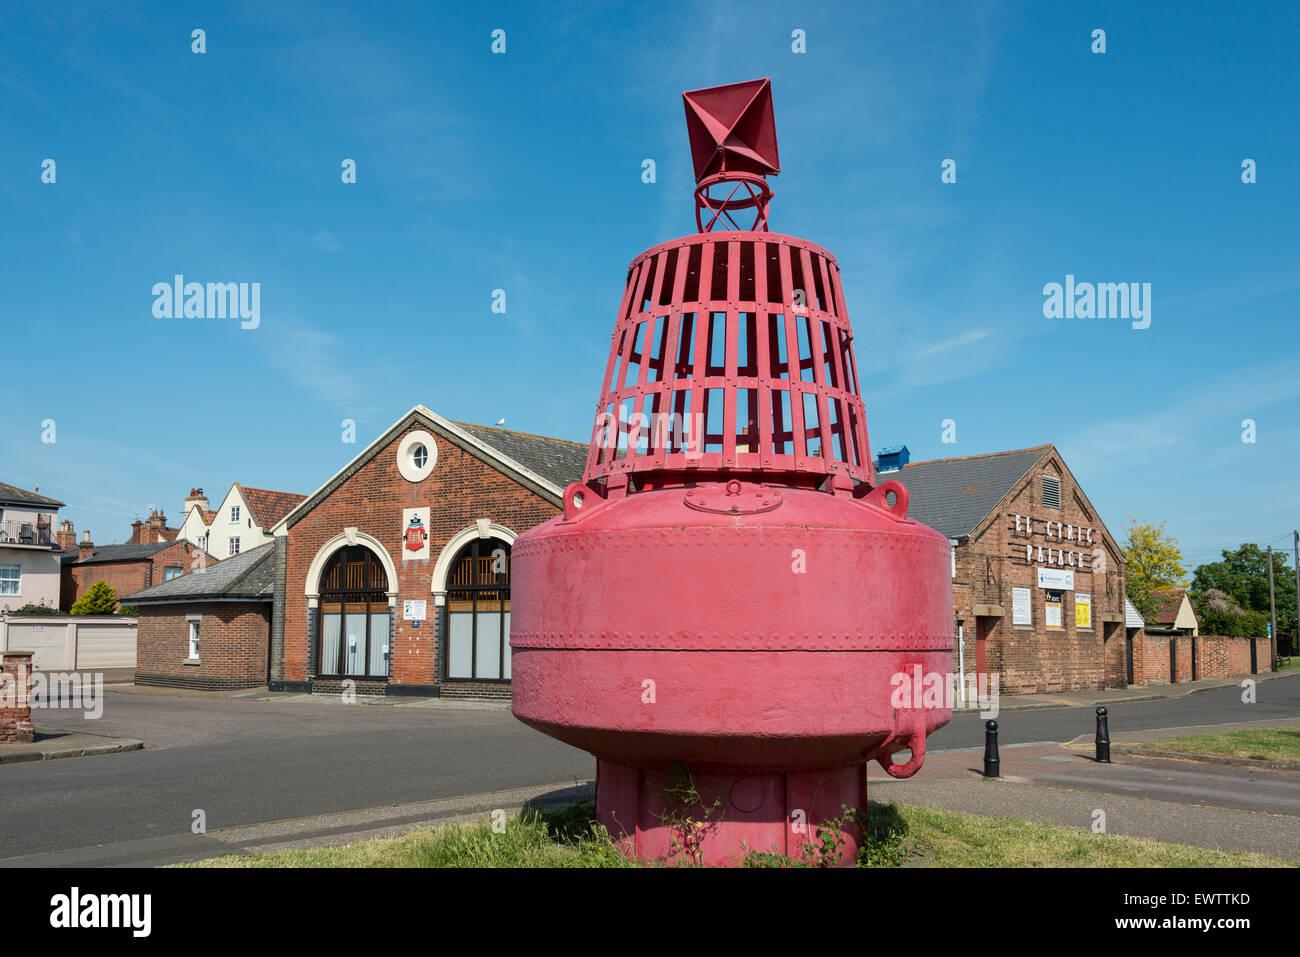 Old Harwich buoy, Wellington Road, Harwich, Essex, England, United Kingdom - Stock Image